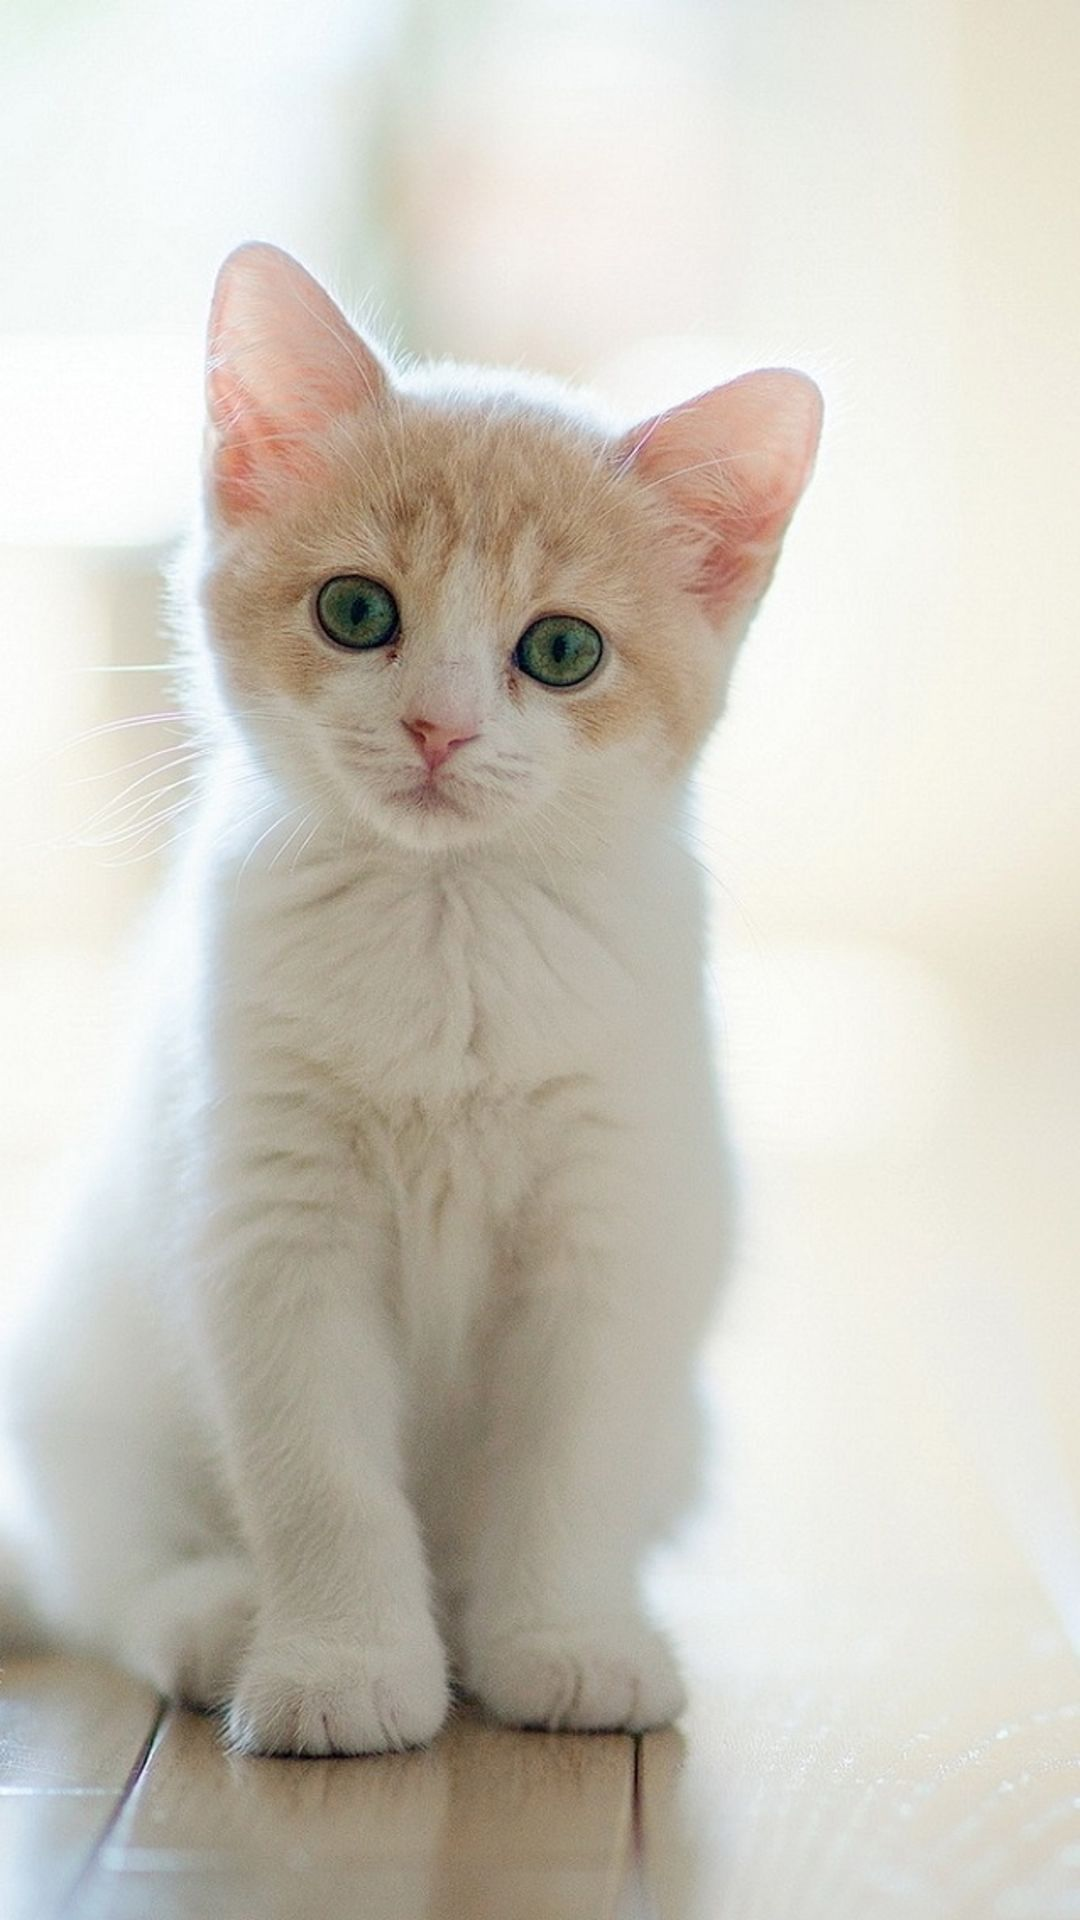 Cute Cat Iphone Wallpapers Top Free Cute Cat Iphone